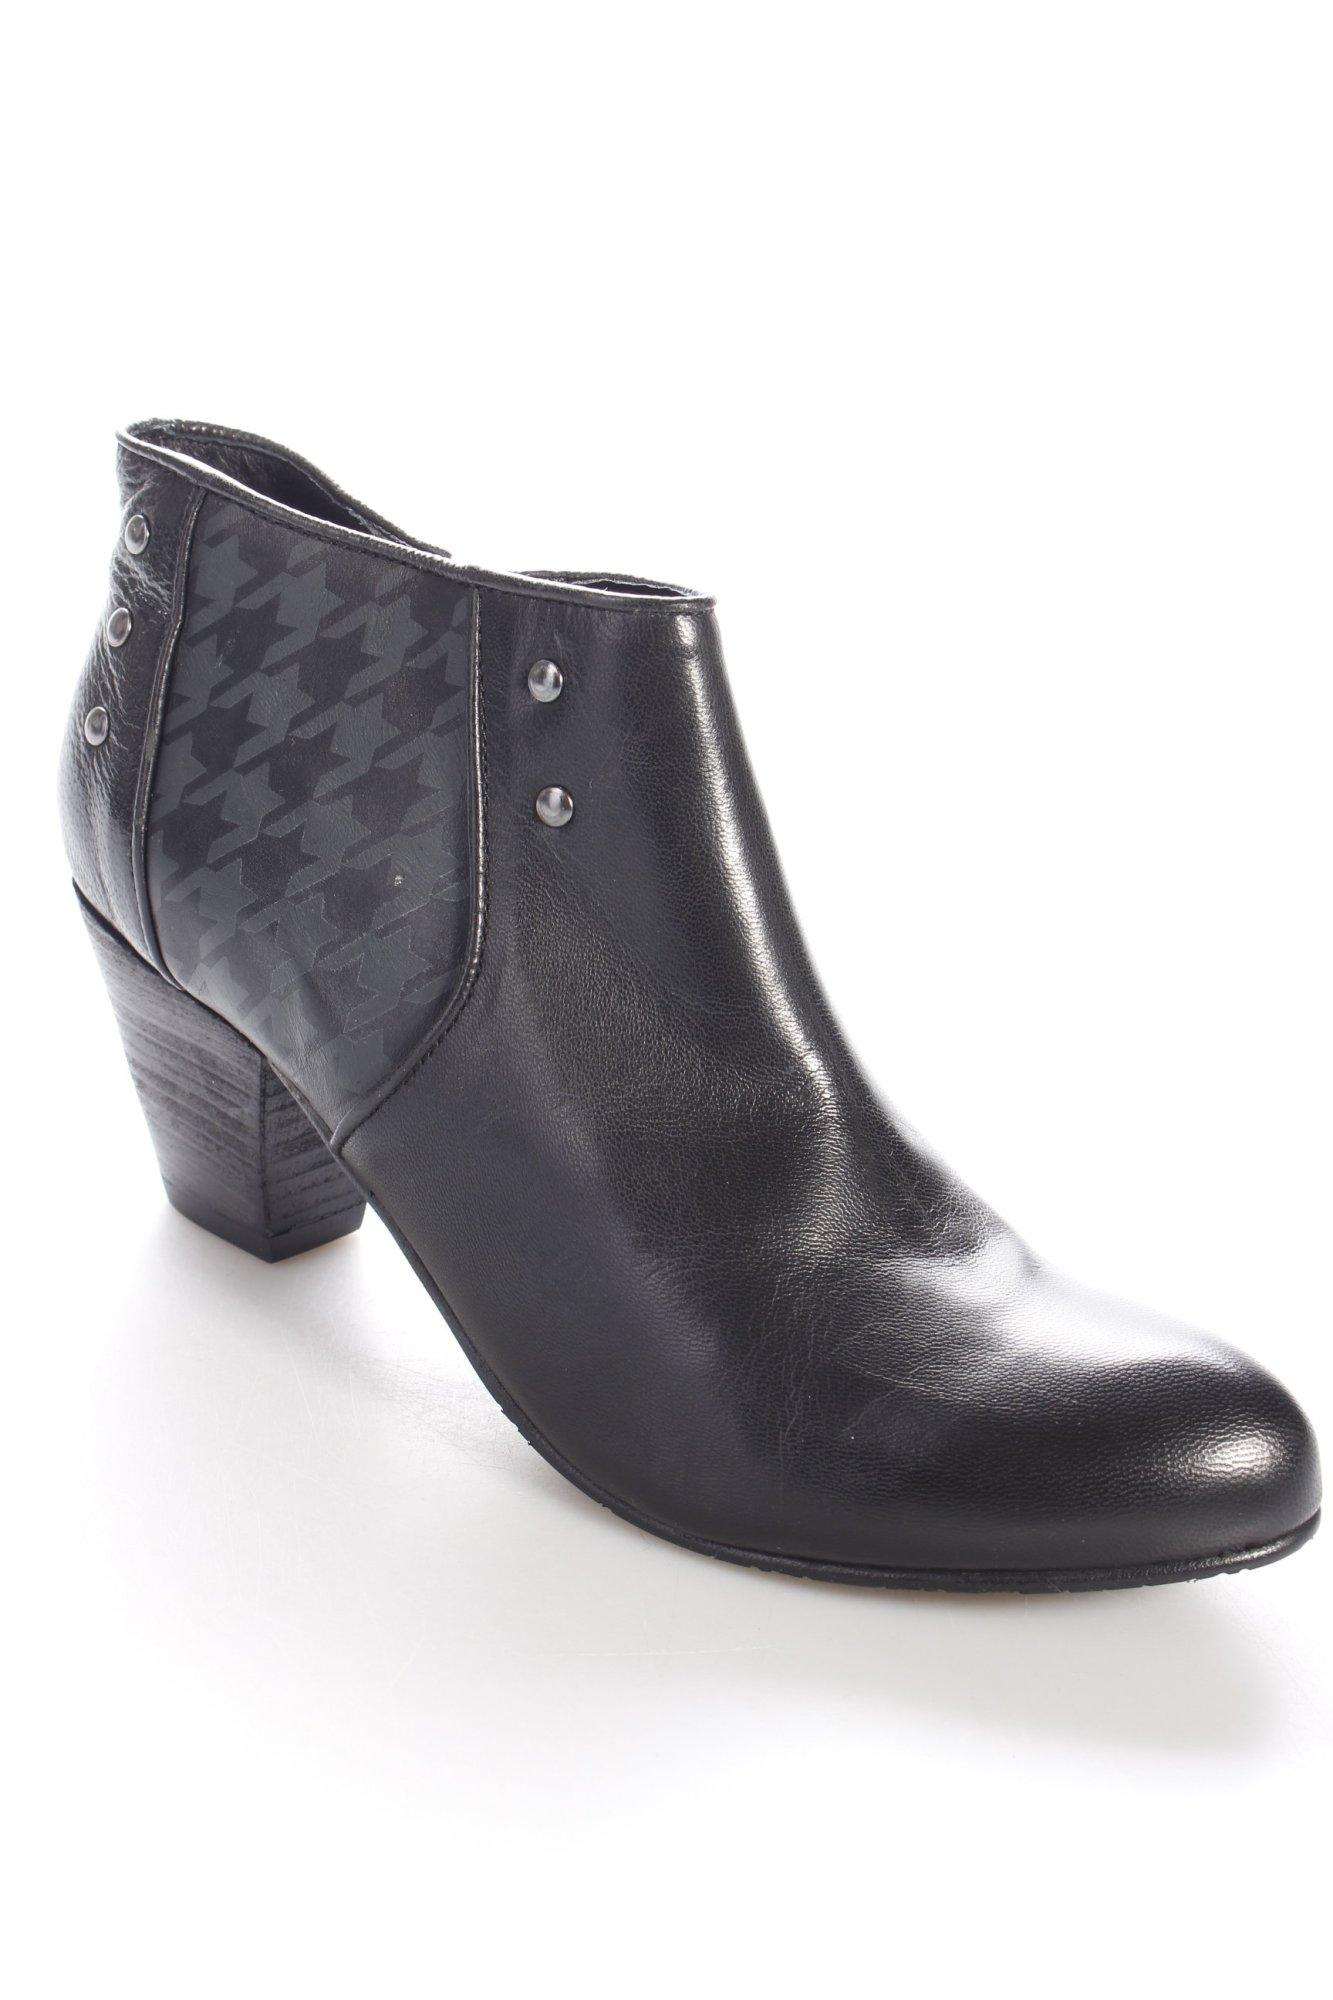 biba ankle boots schwarz nieten detail damen gr de 40. Black Bedroom Furniture Sets. Home Design Ideas